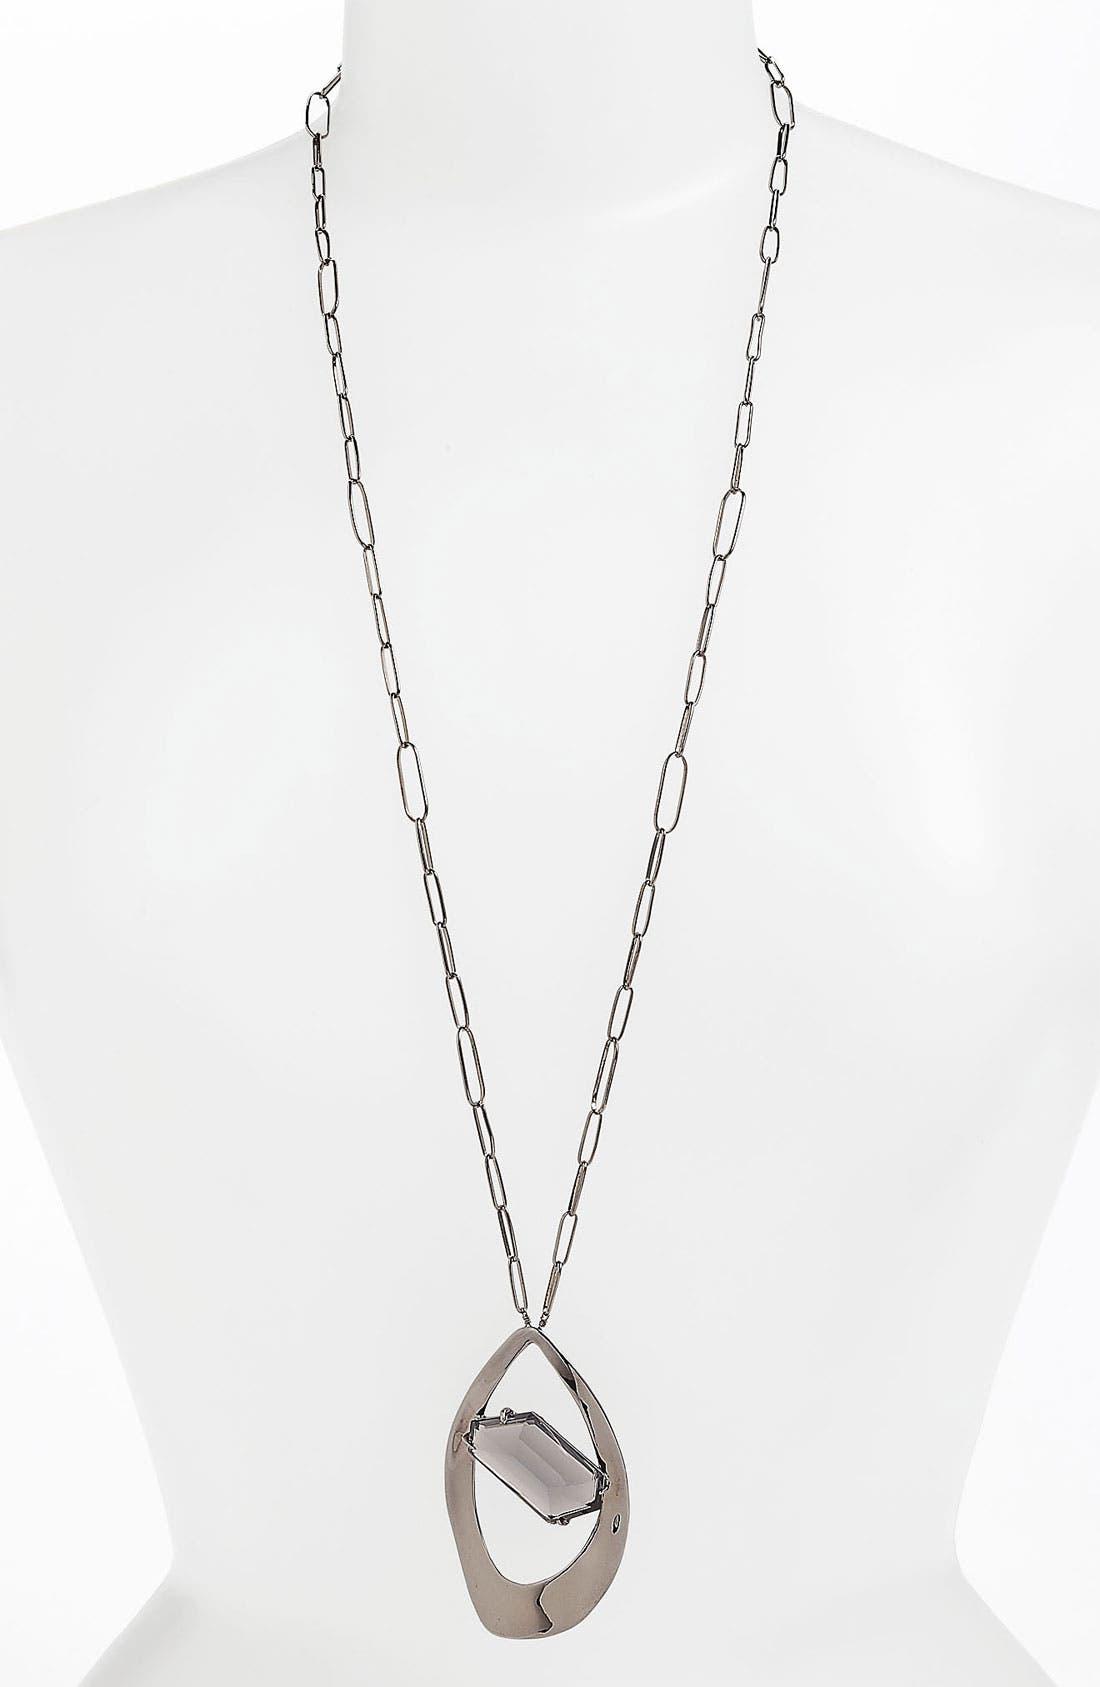 Main Image - Alexis Bittar 'Miss Havisham - Bel Air' Wavy Pendant Necklace (Nordstrom Exclusive)